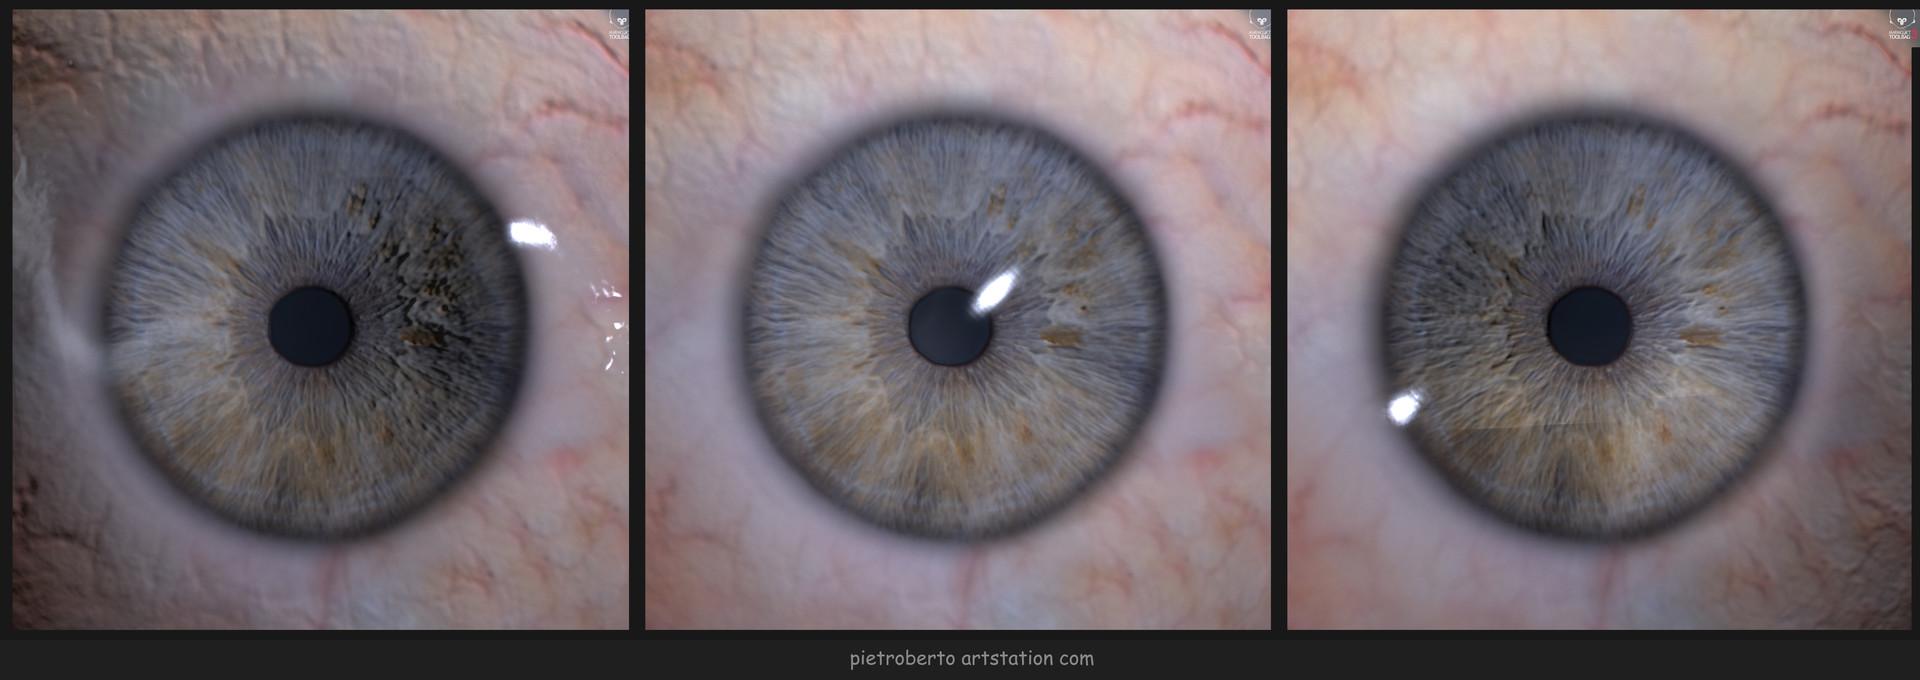 Pietro berto eye